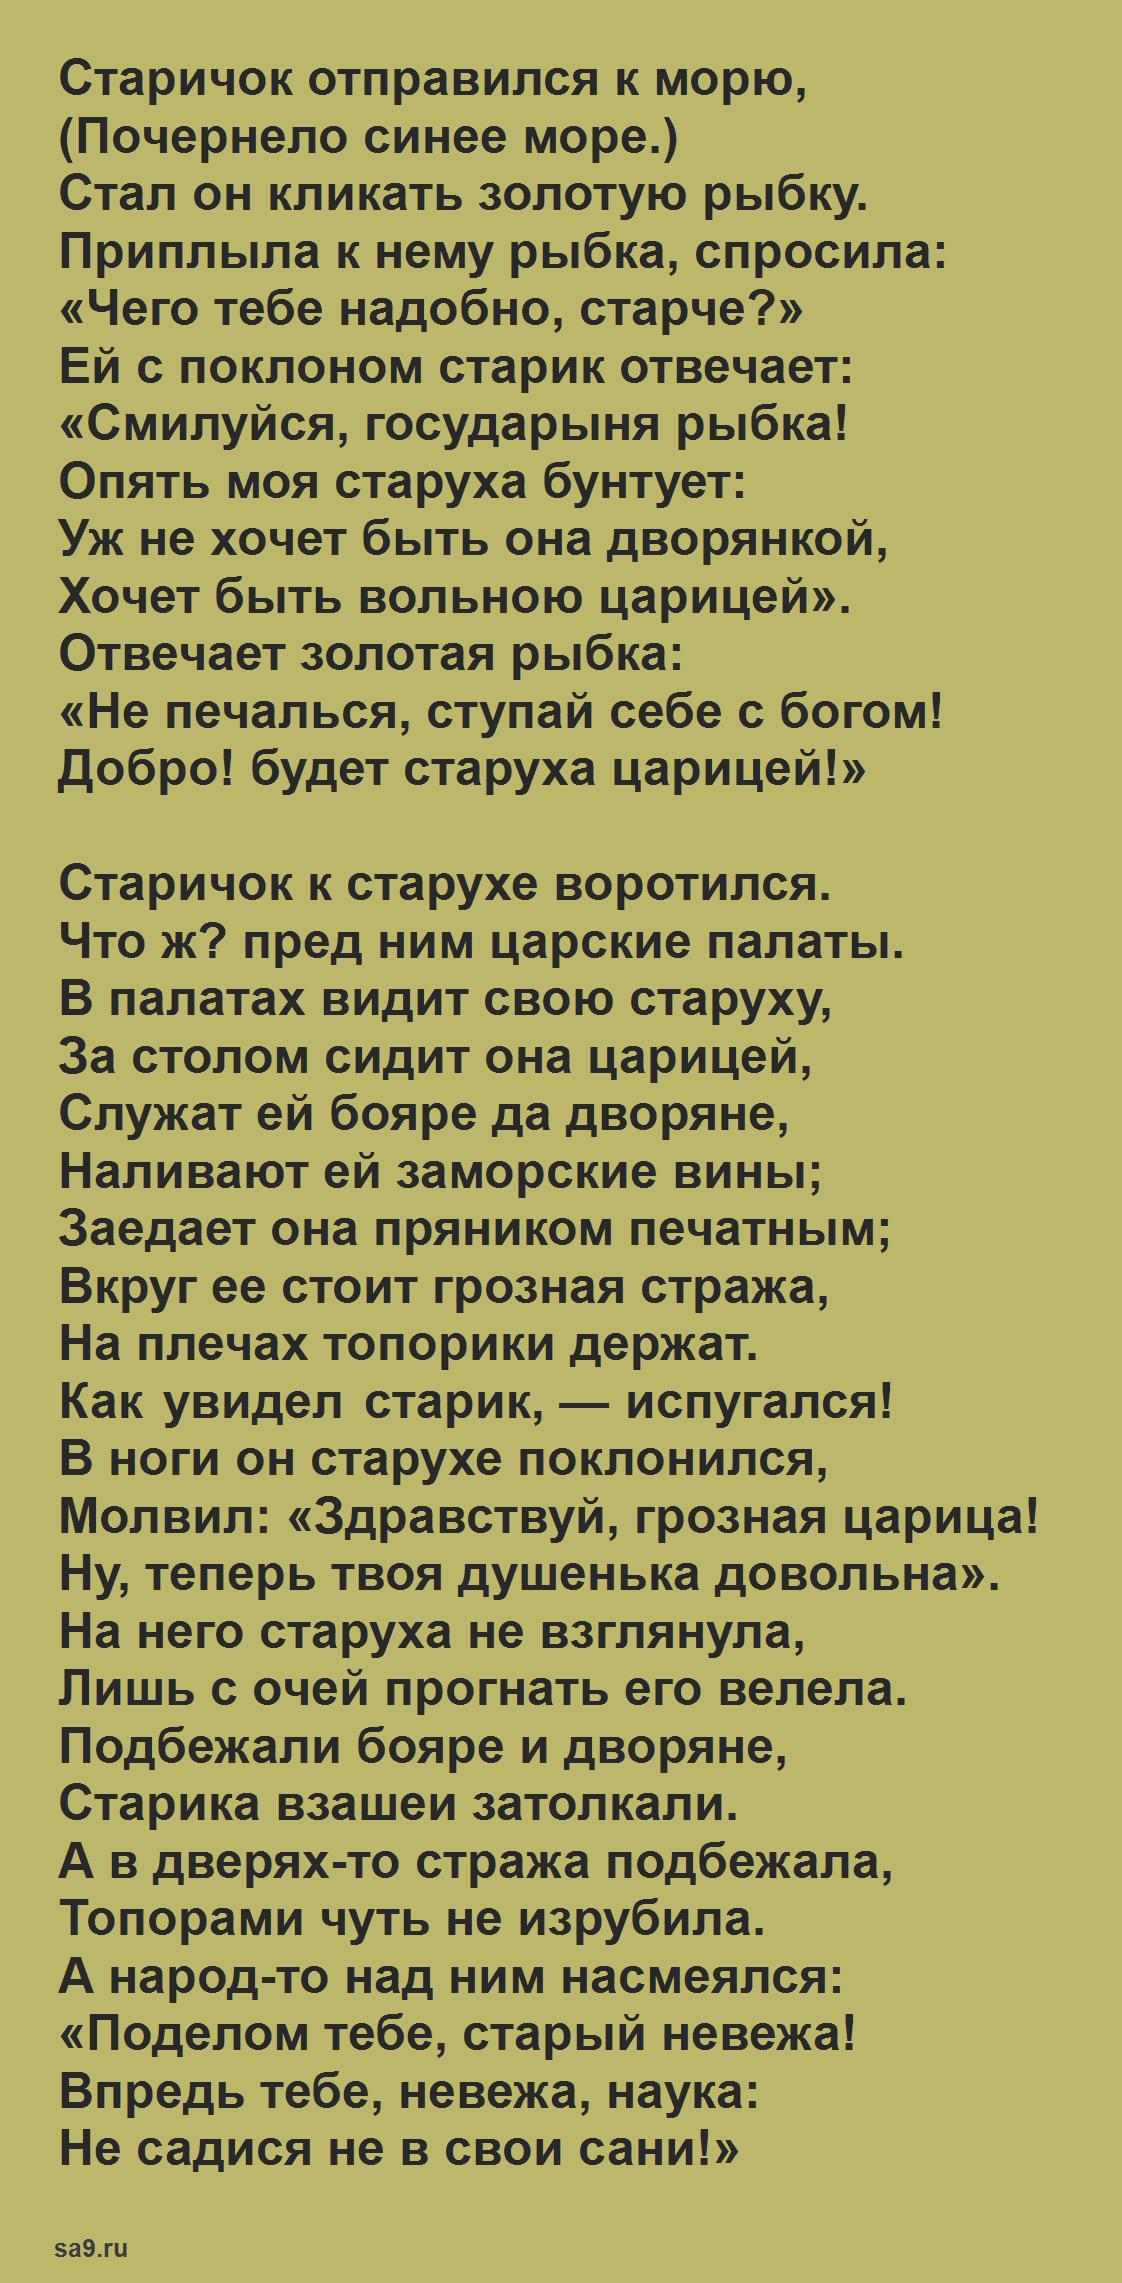 Сказка 'О рыбаке и рыбке', Пушкин